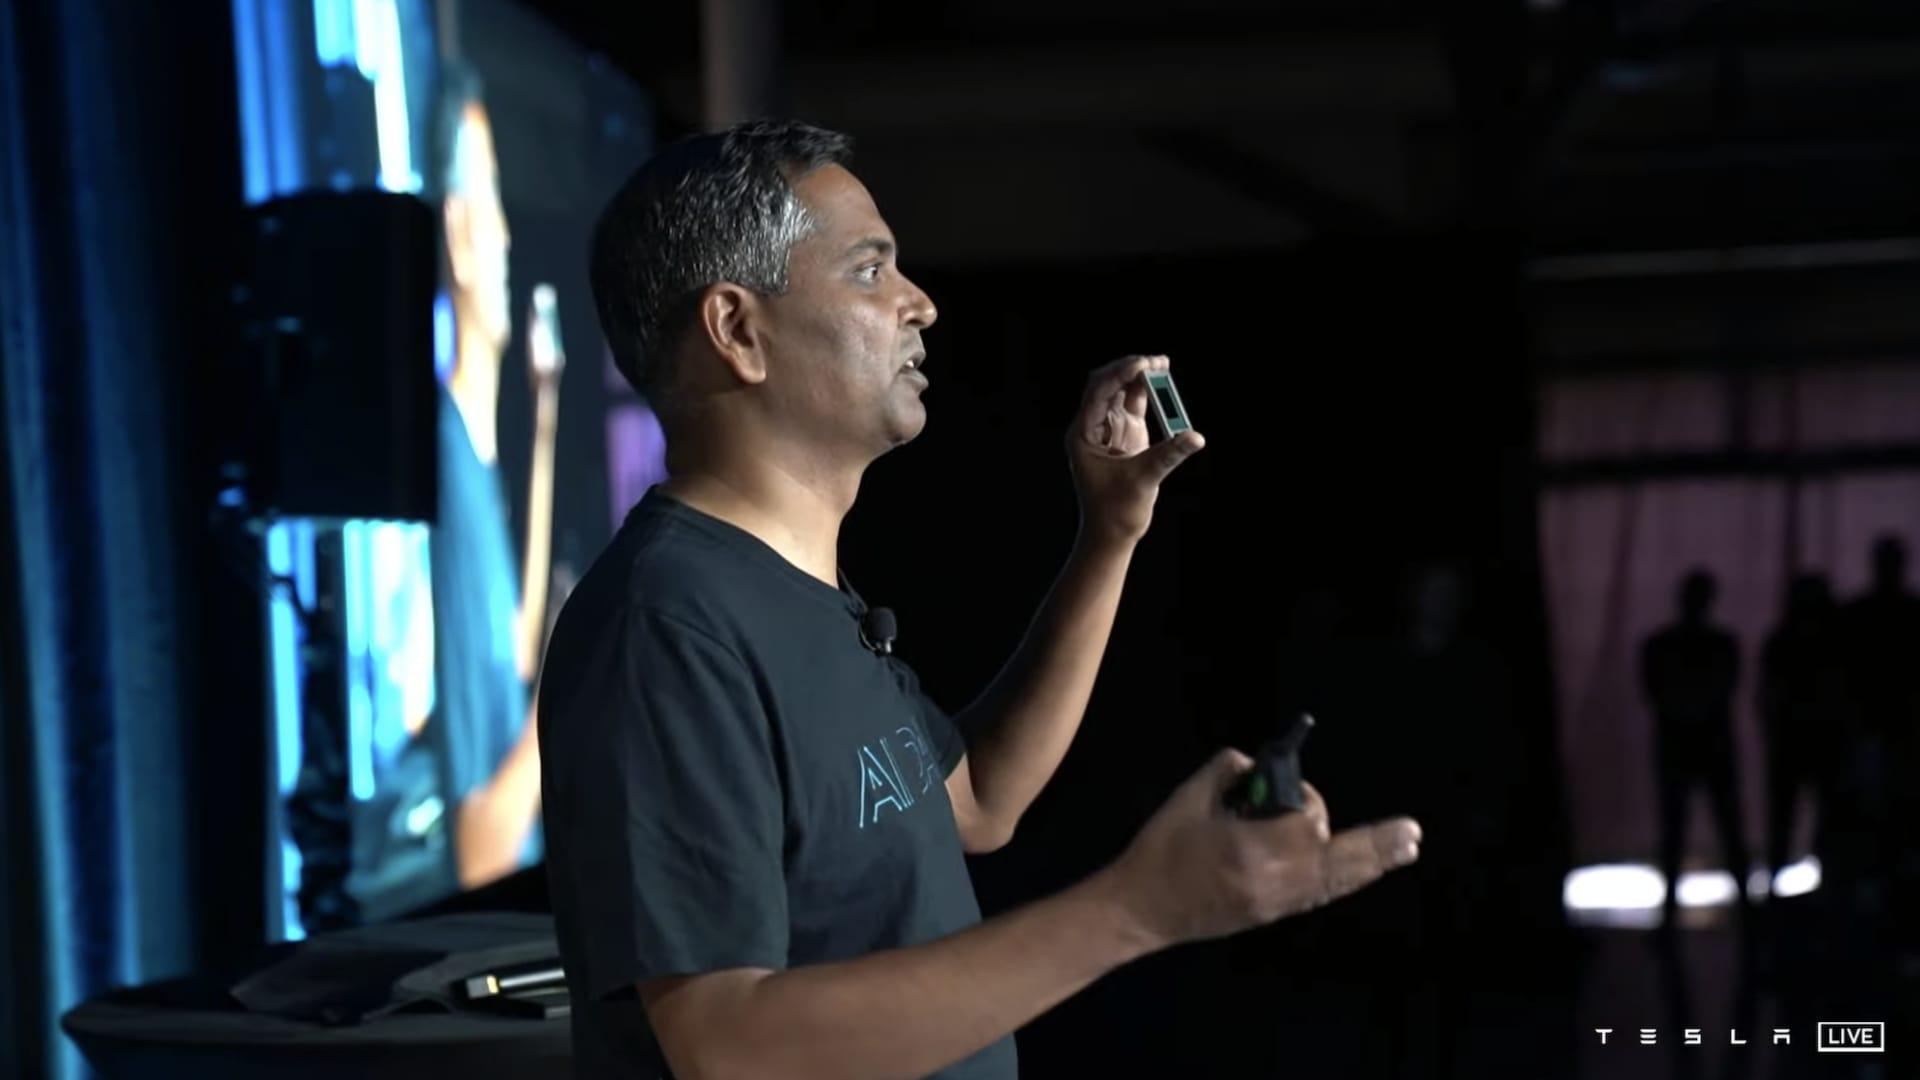 Ganesh Venkataramanan, senior director of Autopilot hardware at Tesla, shows a D1 training chip during Tesla's live-streamed AI Day on Aug. 19, 2021.